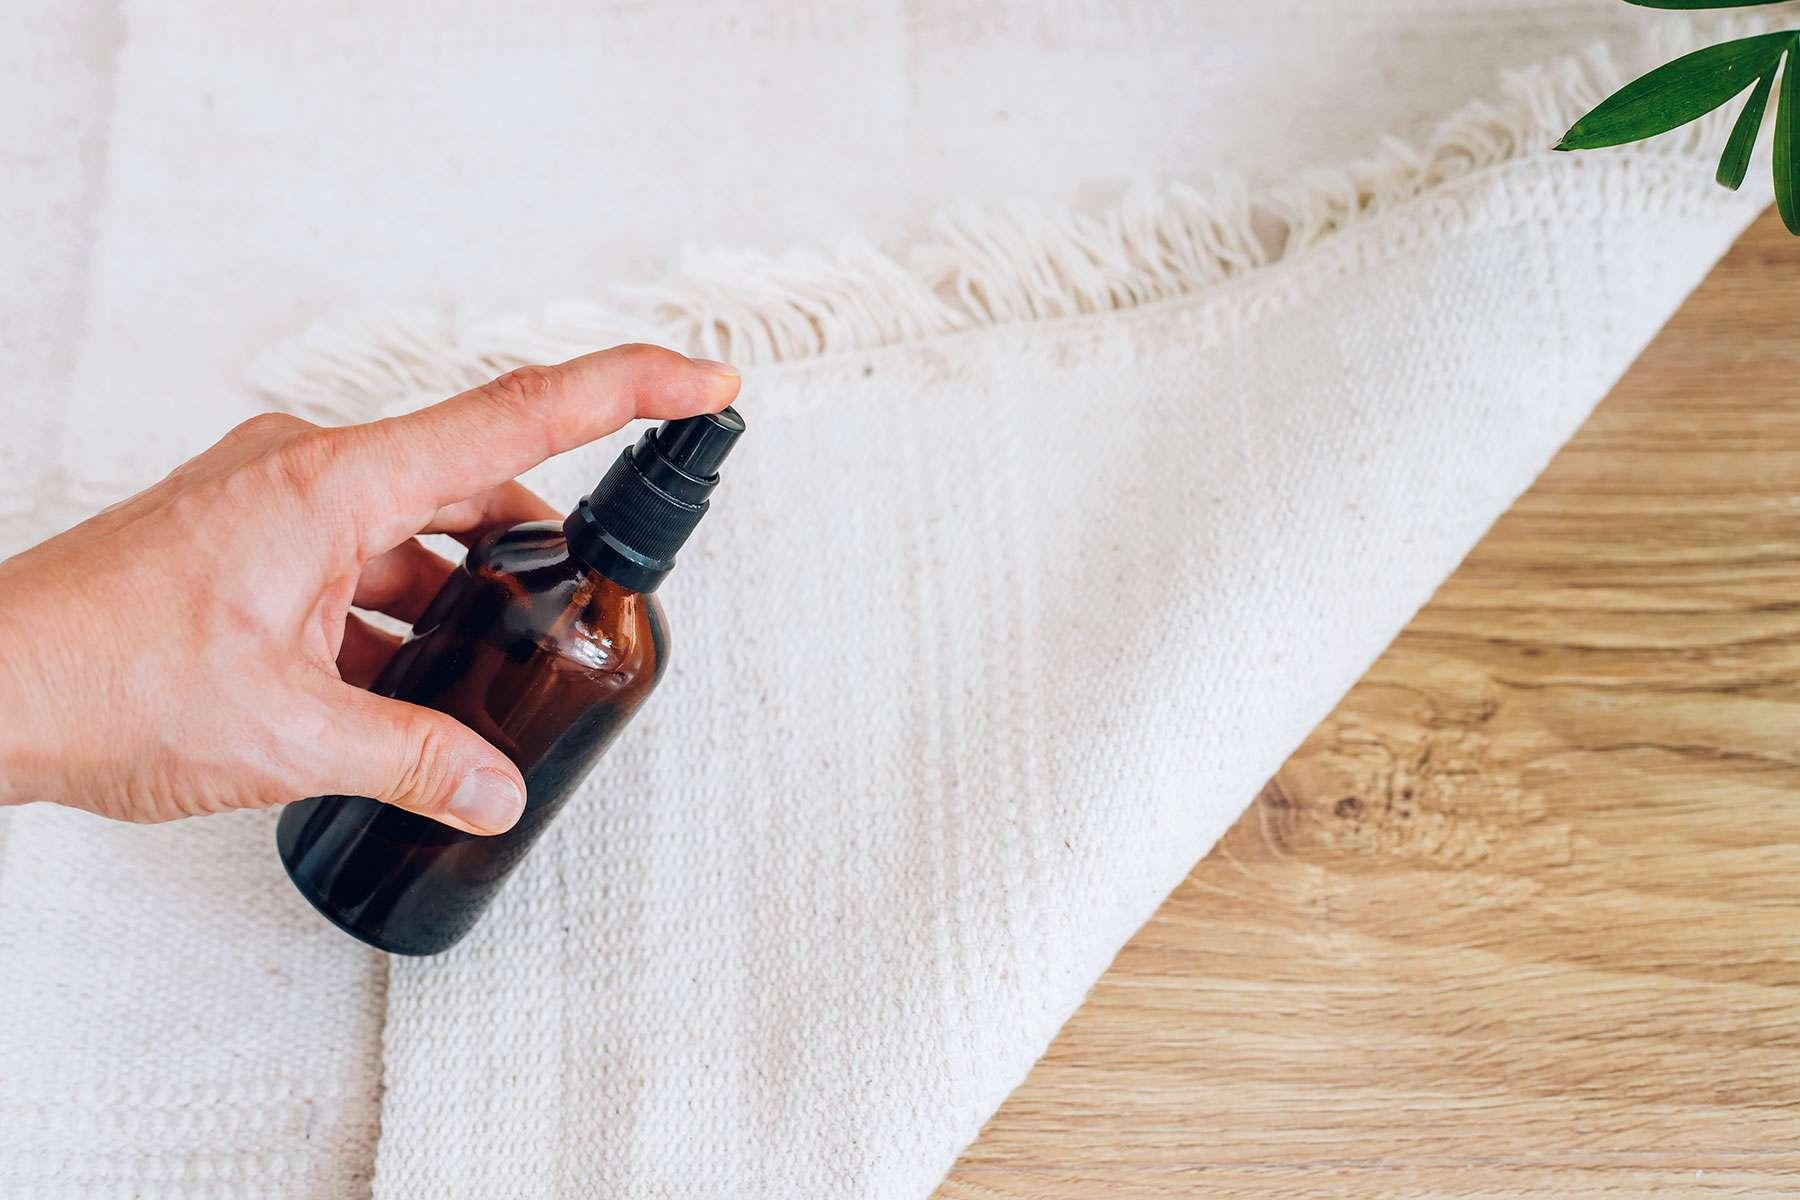 Tan carpet soaked with anti-mold spray